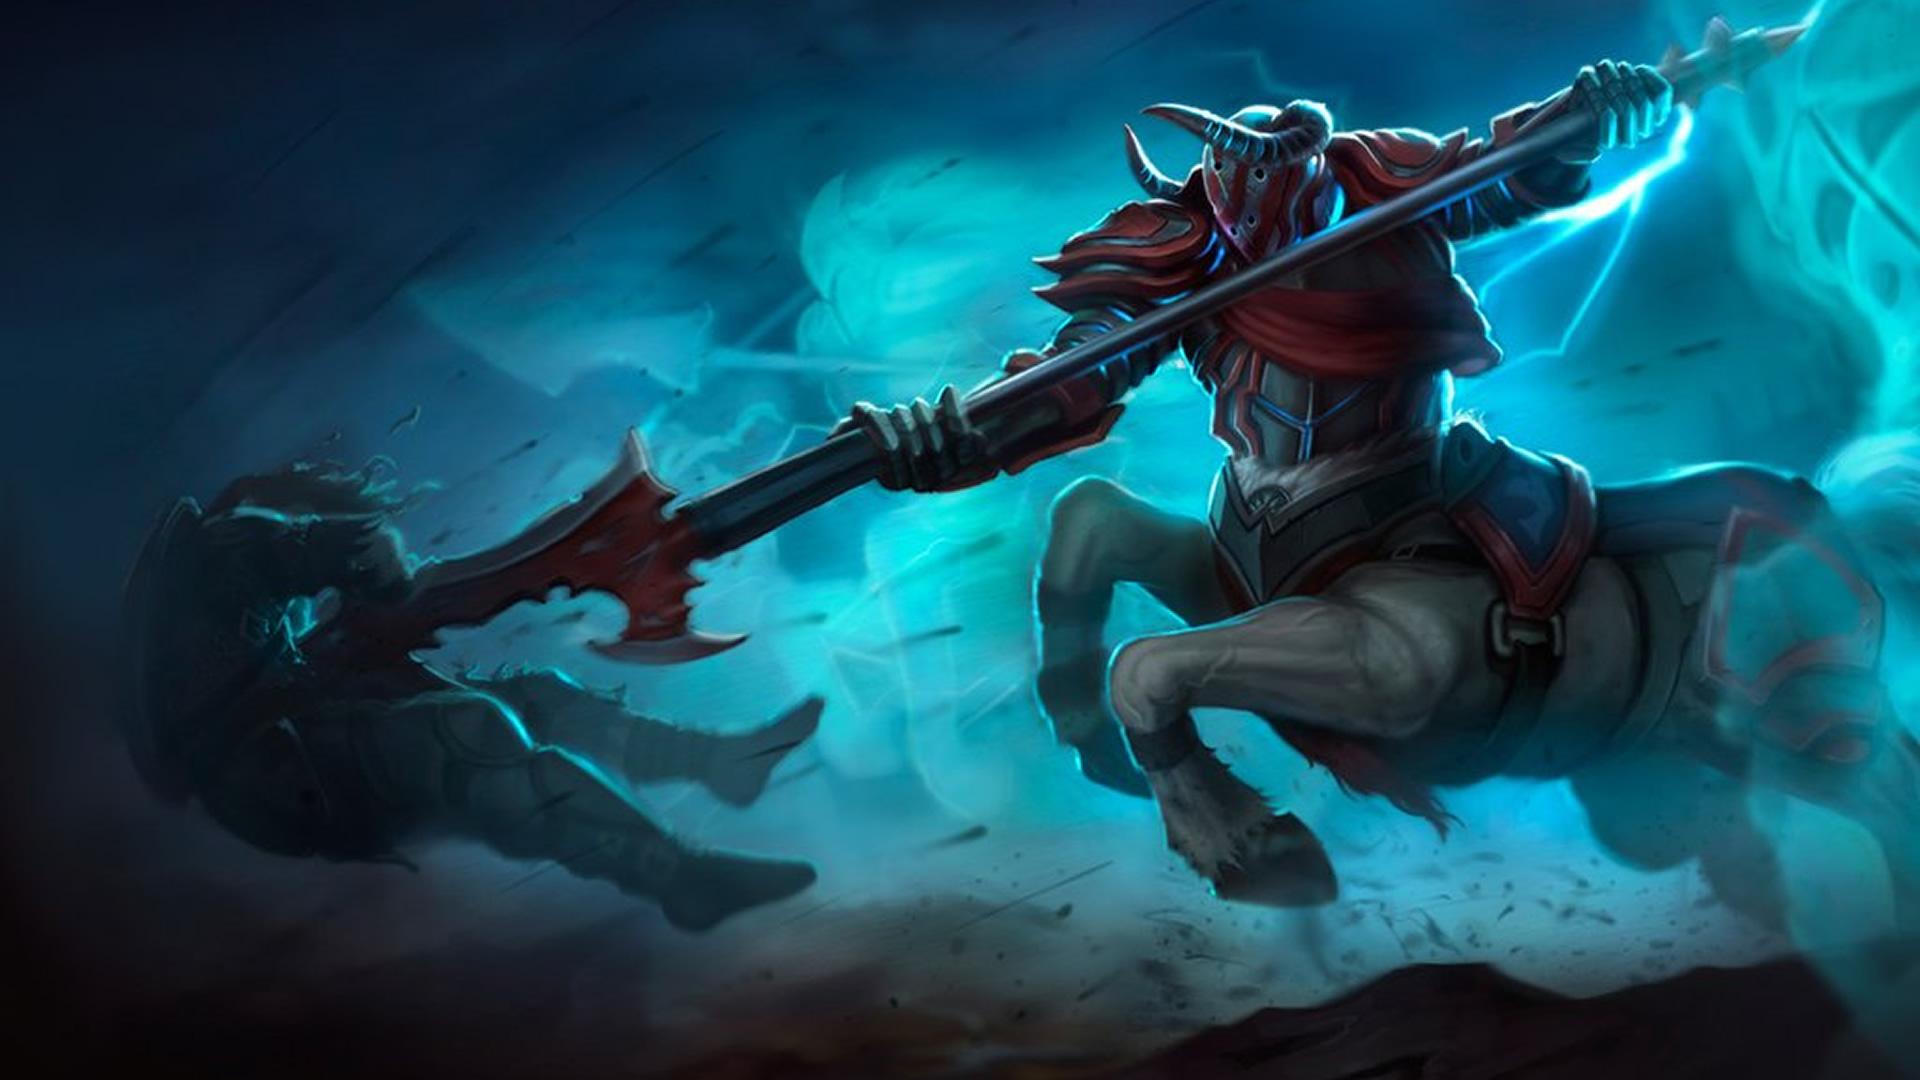 Blood Knight Hecarim wallpaper